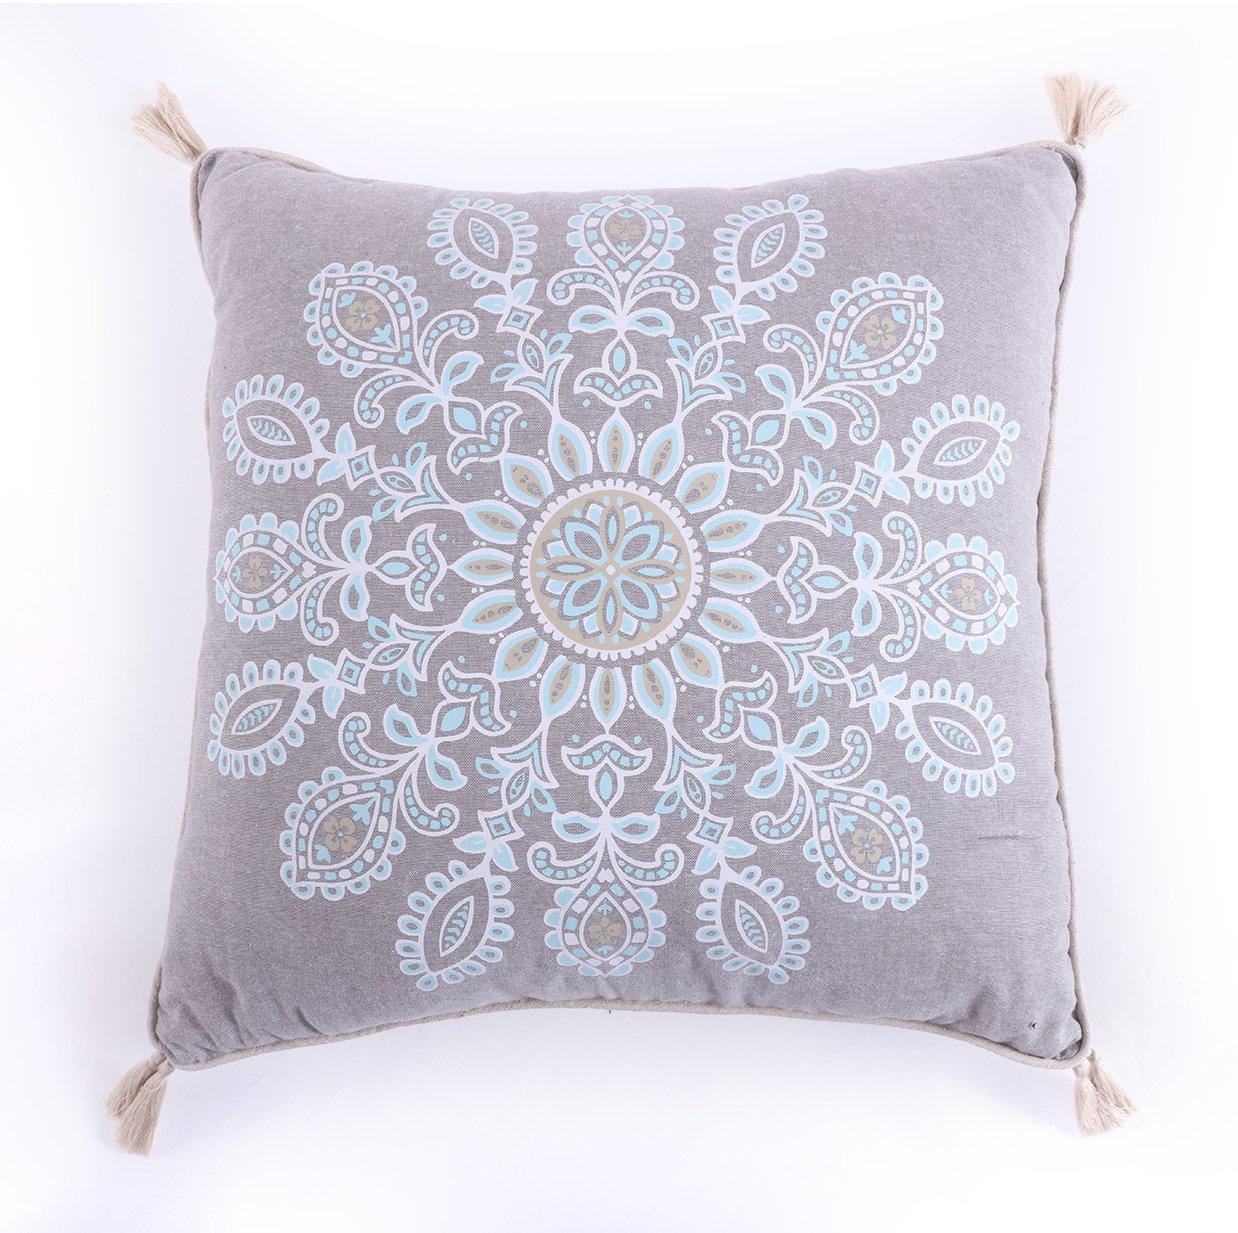 Levtex Spruce Spa Print Tassel Pillow, Brown